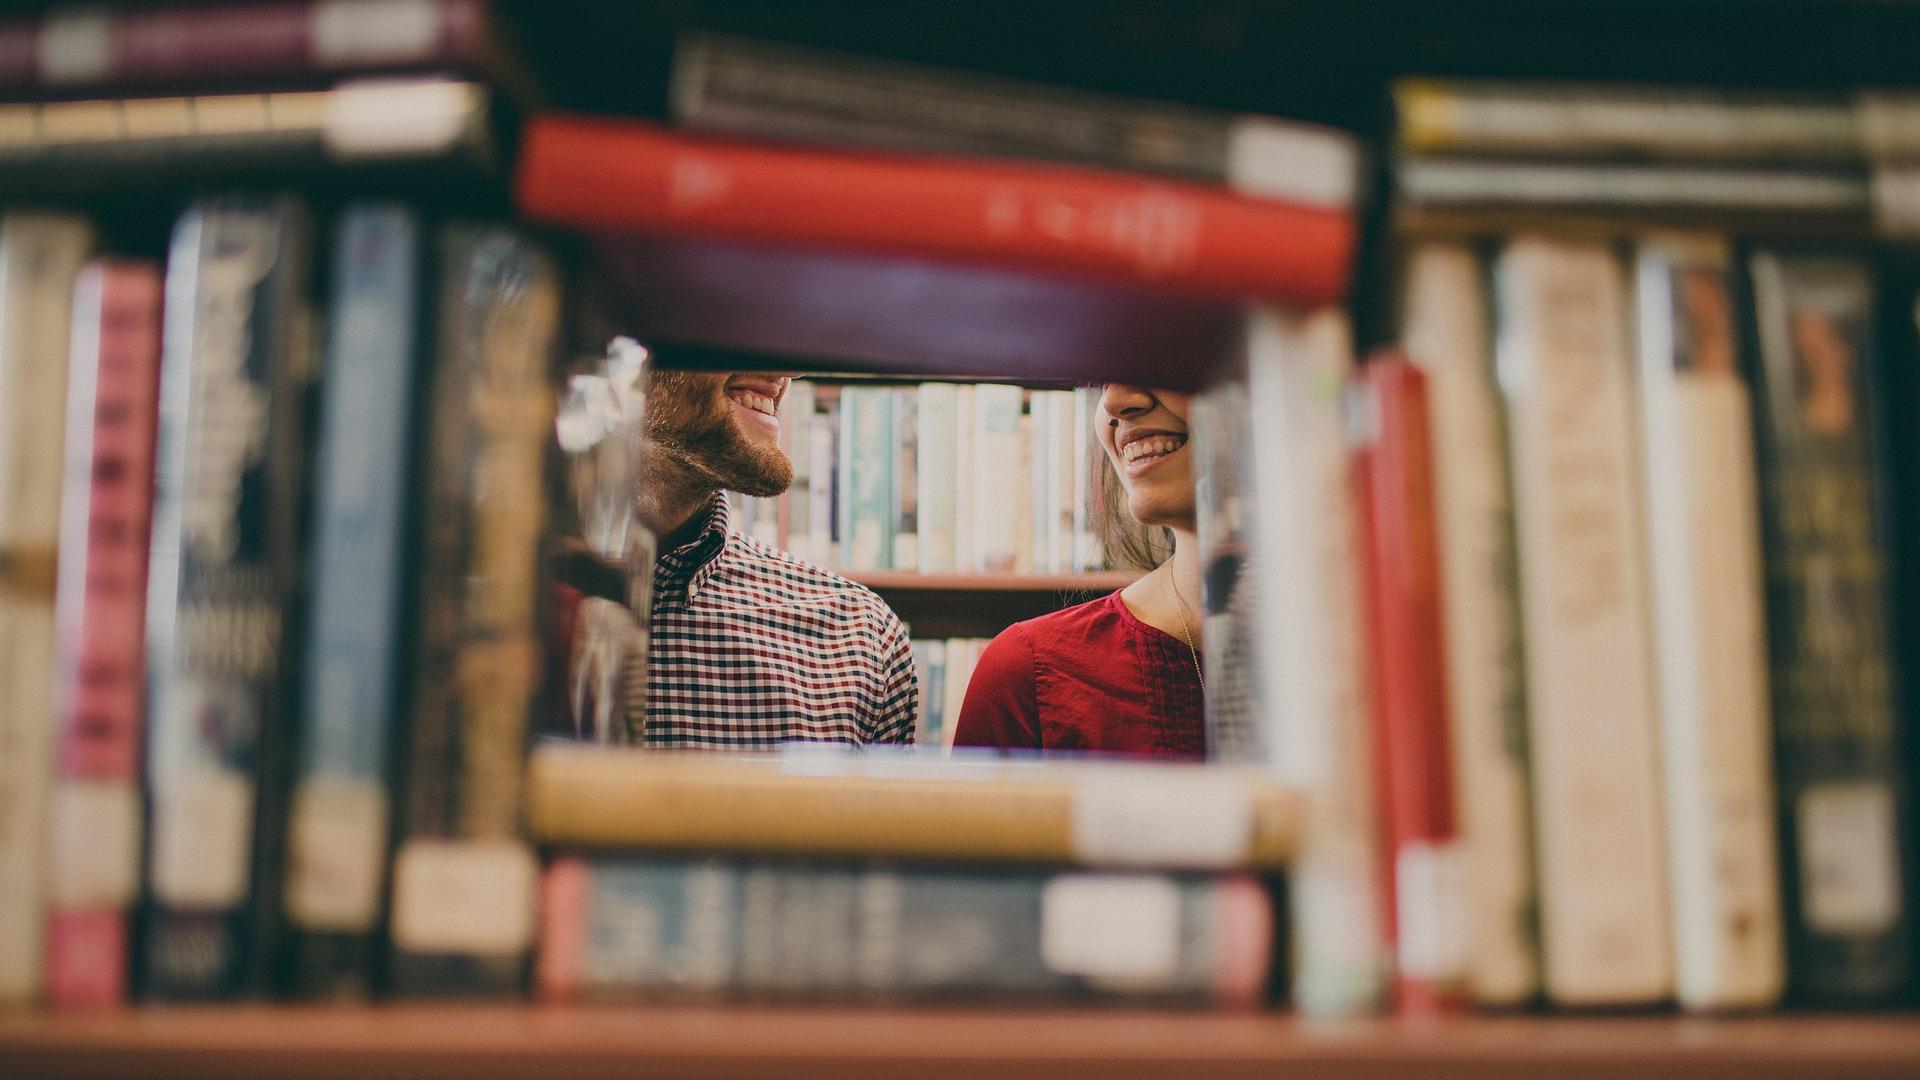 library-2616960_1920.jpg